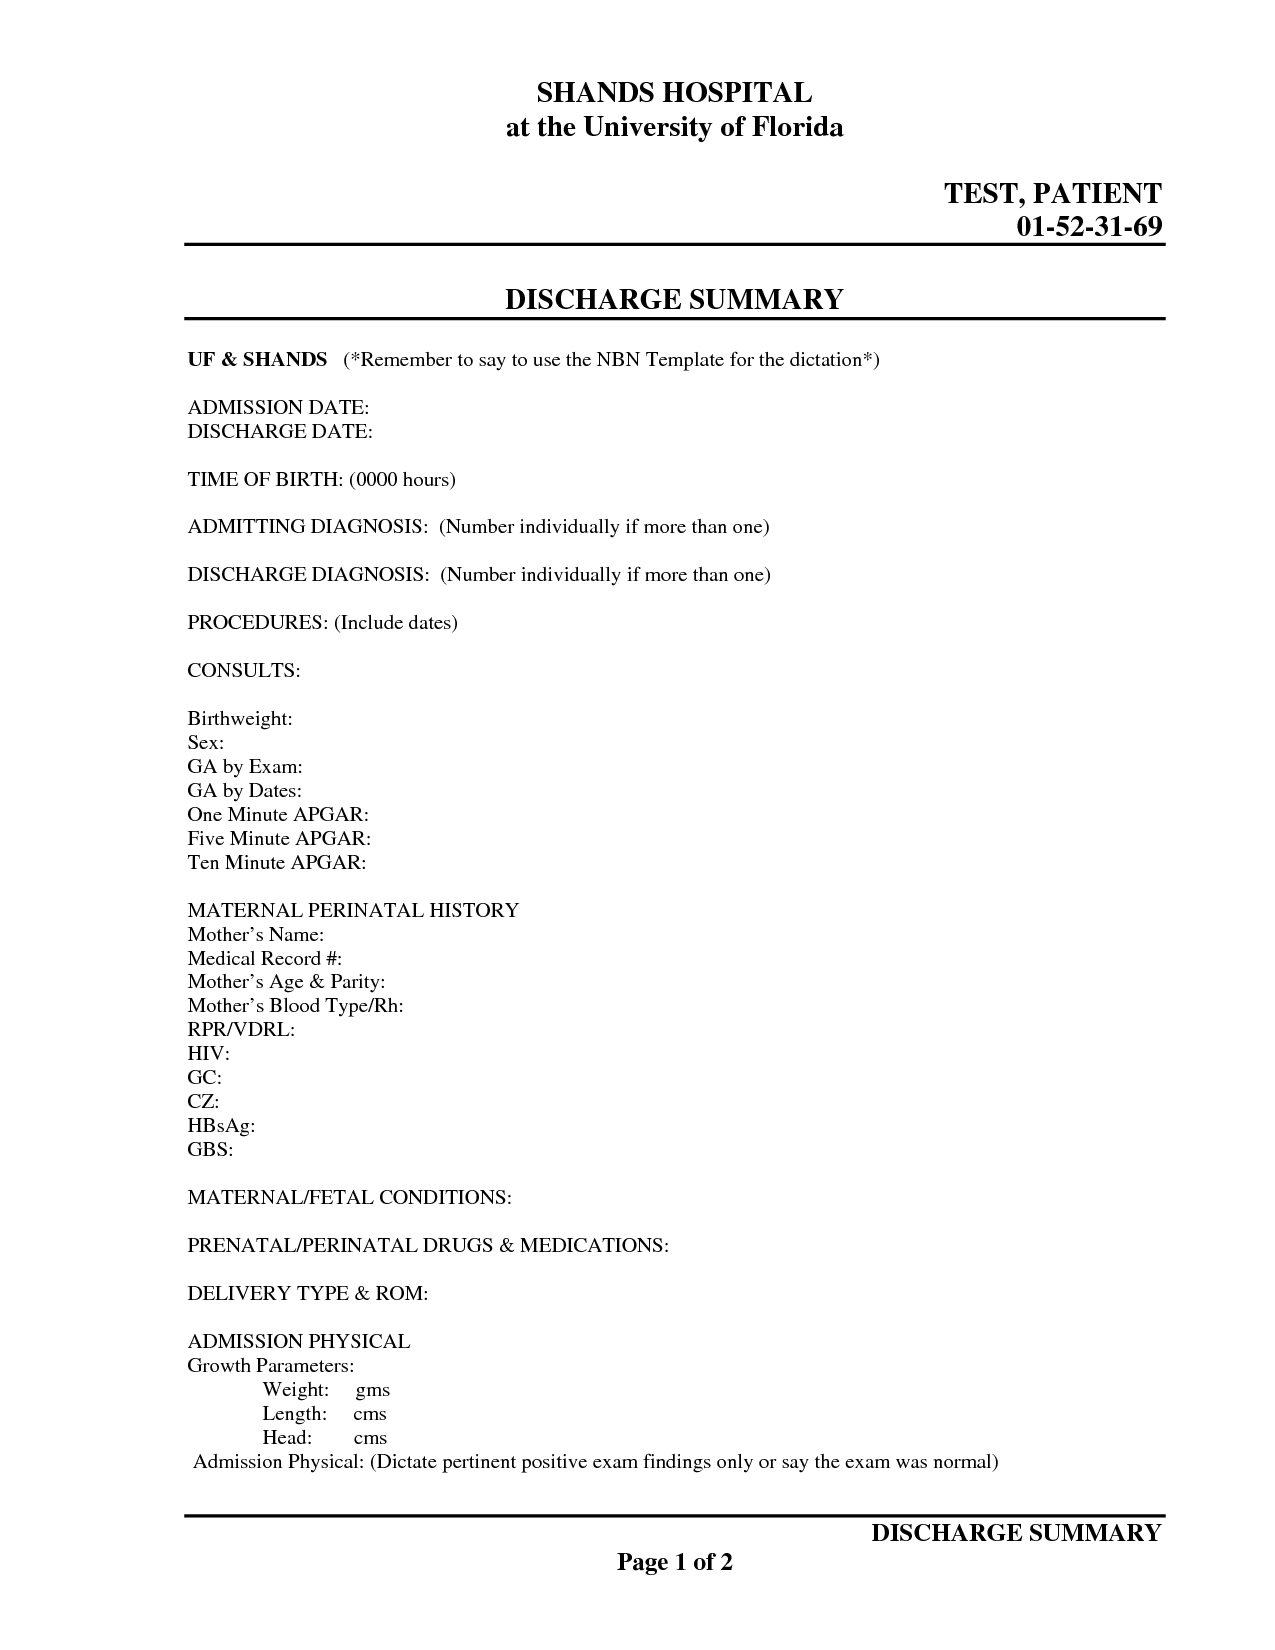 Discharge Summary Template | http://webdesign14.com/